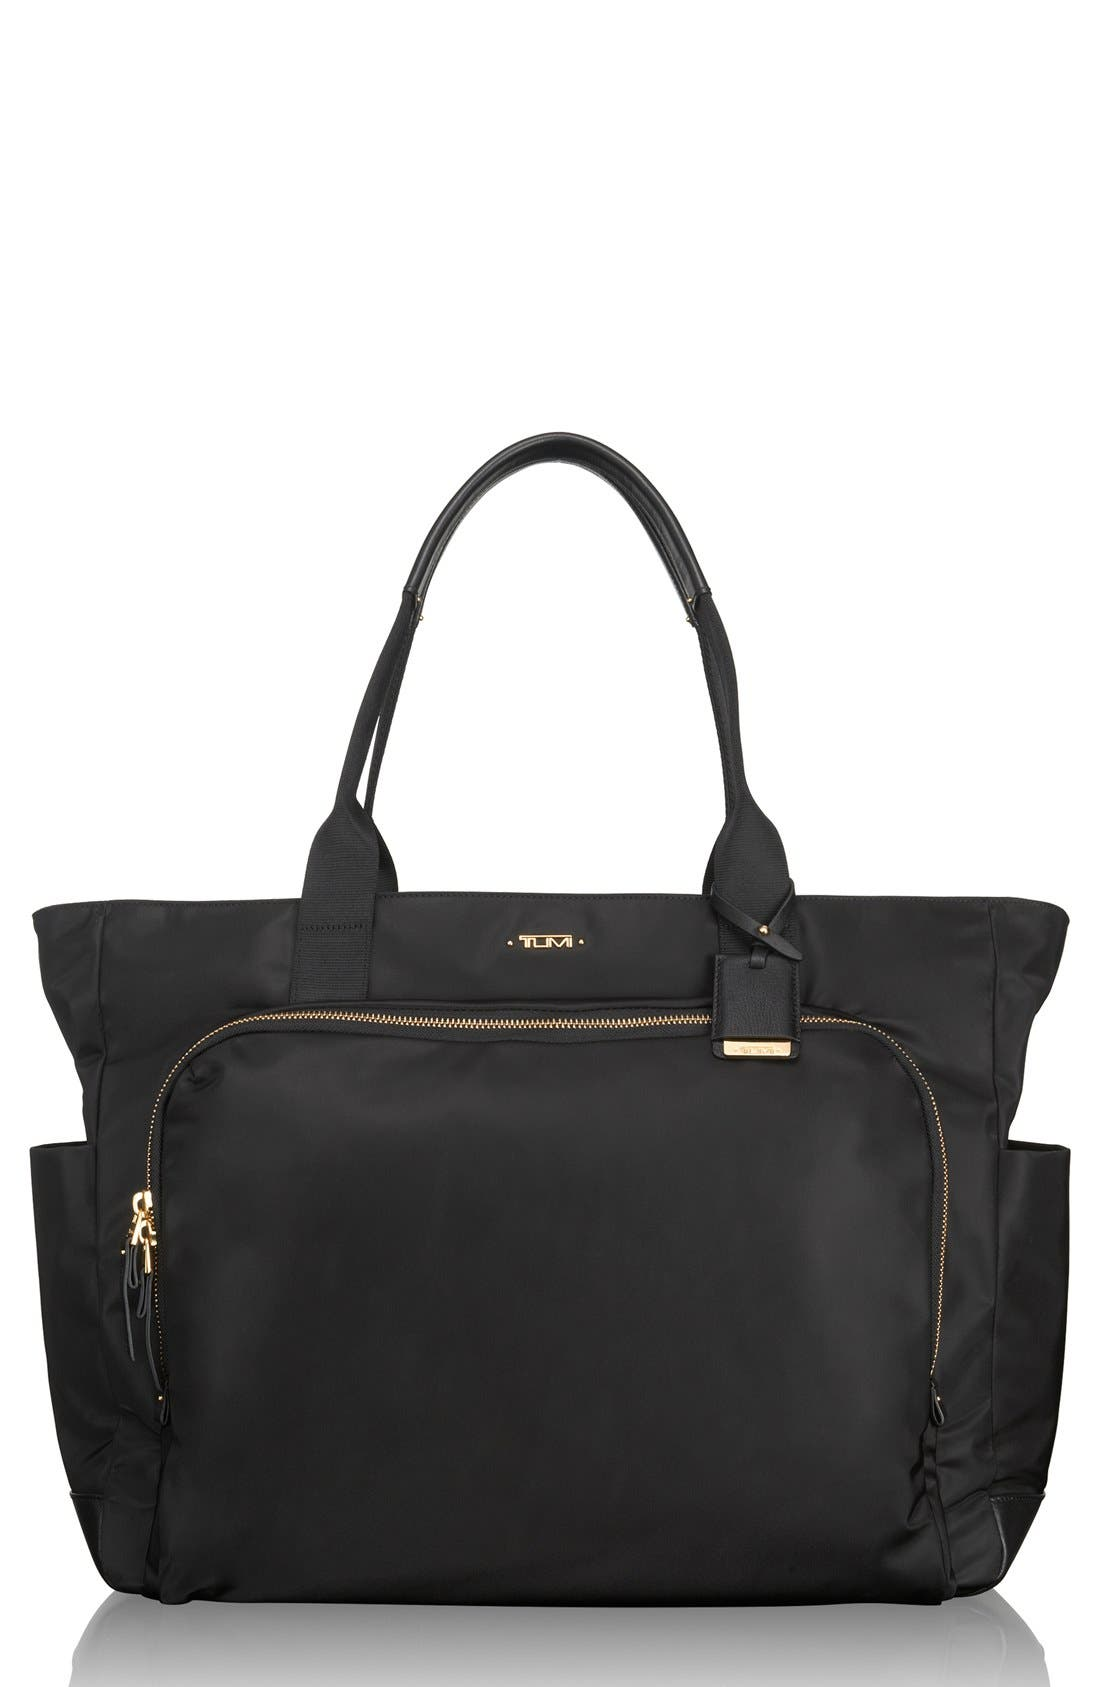 Tumi 'Mansion' Shoulder Tote/Baby Bag